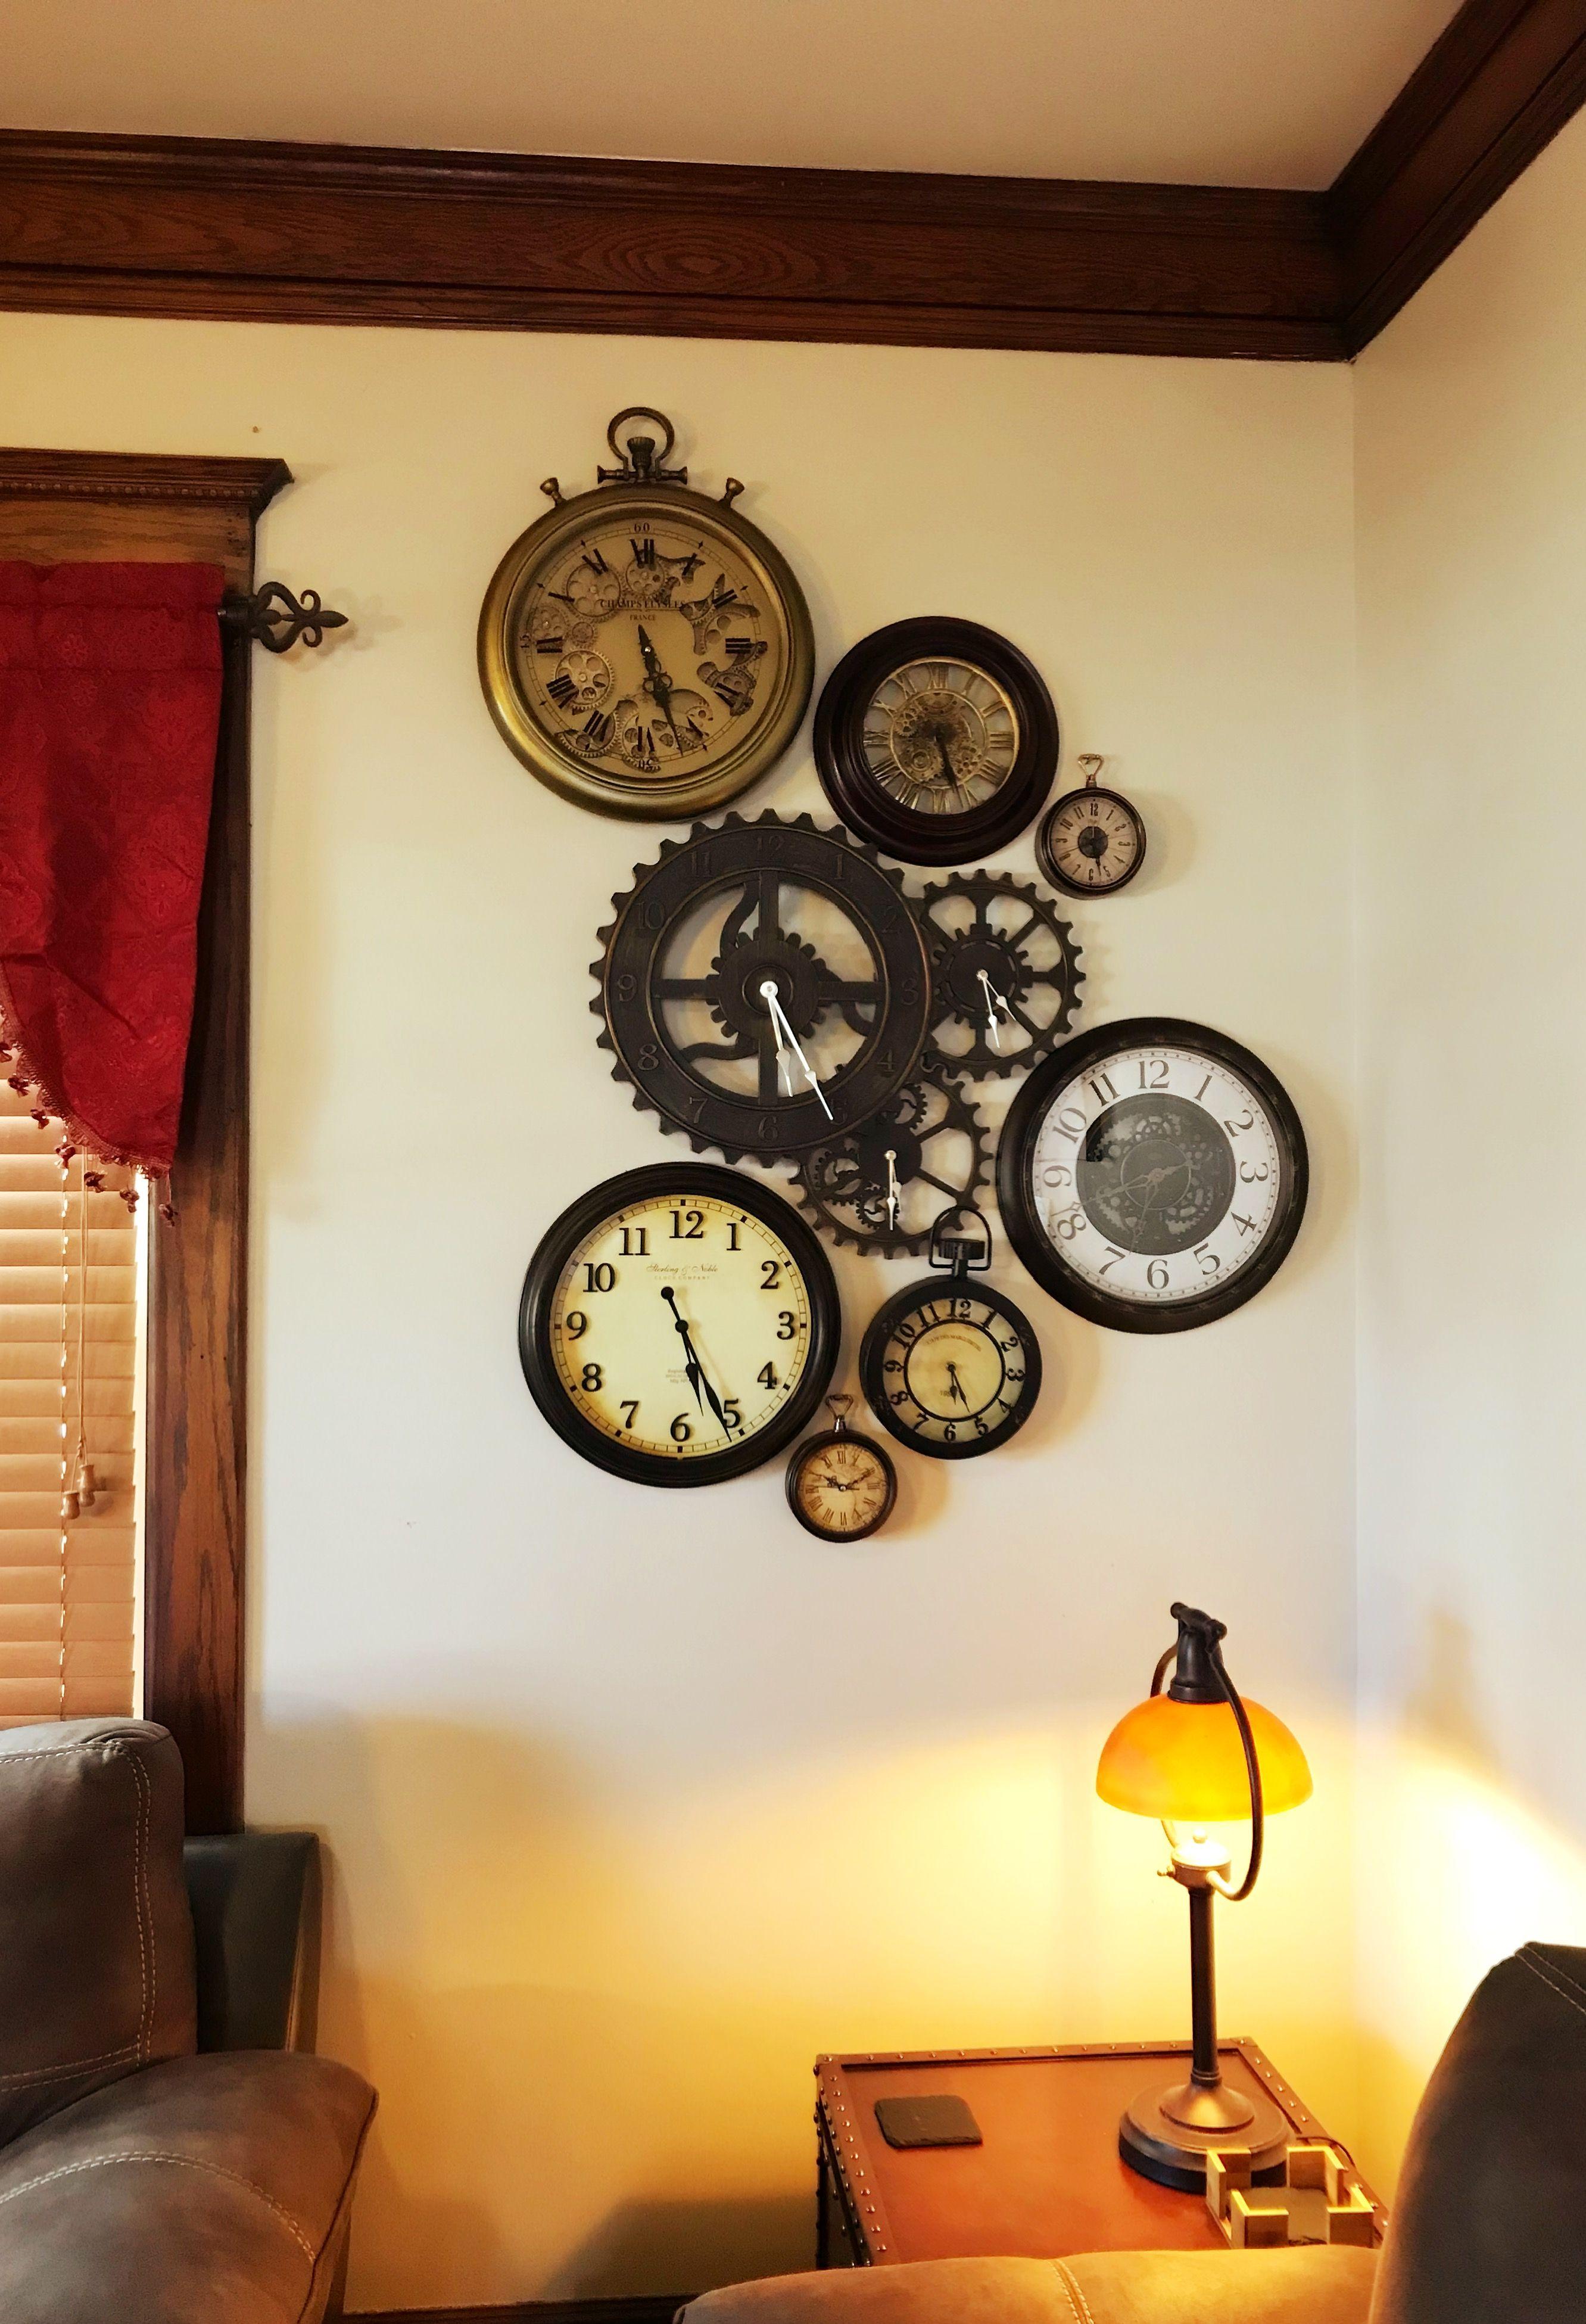 Clocks clock decor steampunk decor steampunk interior wall decor vintage decor